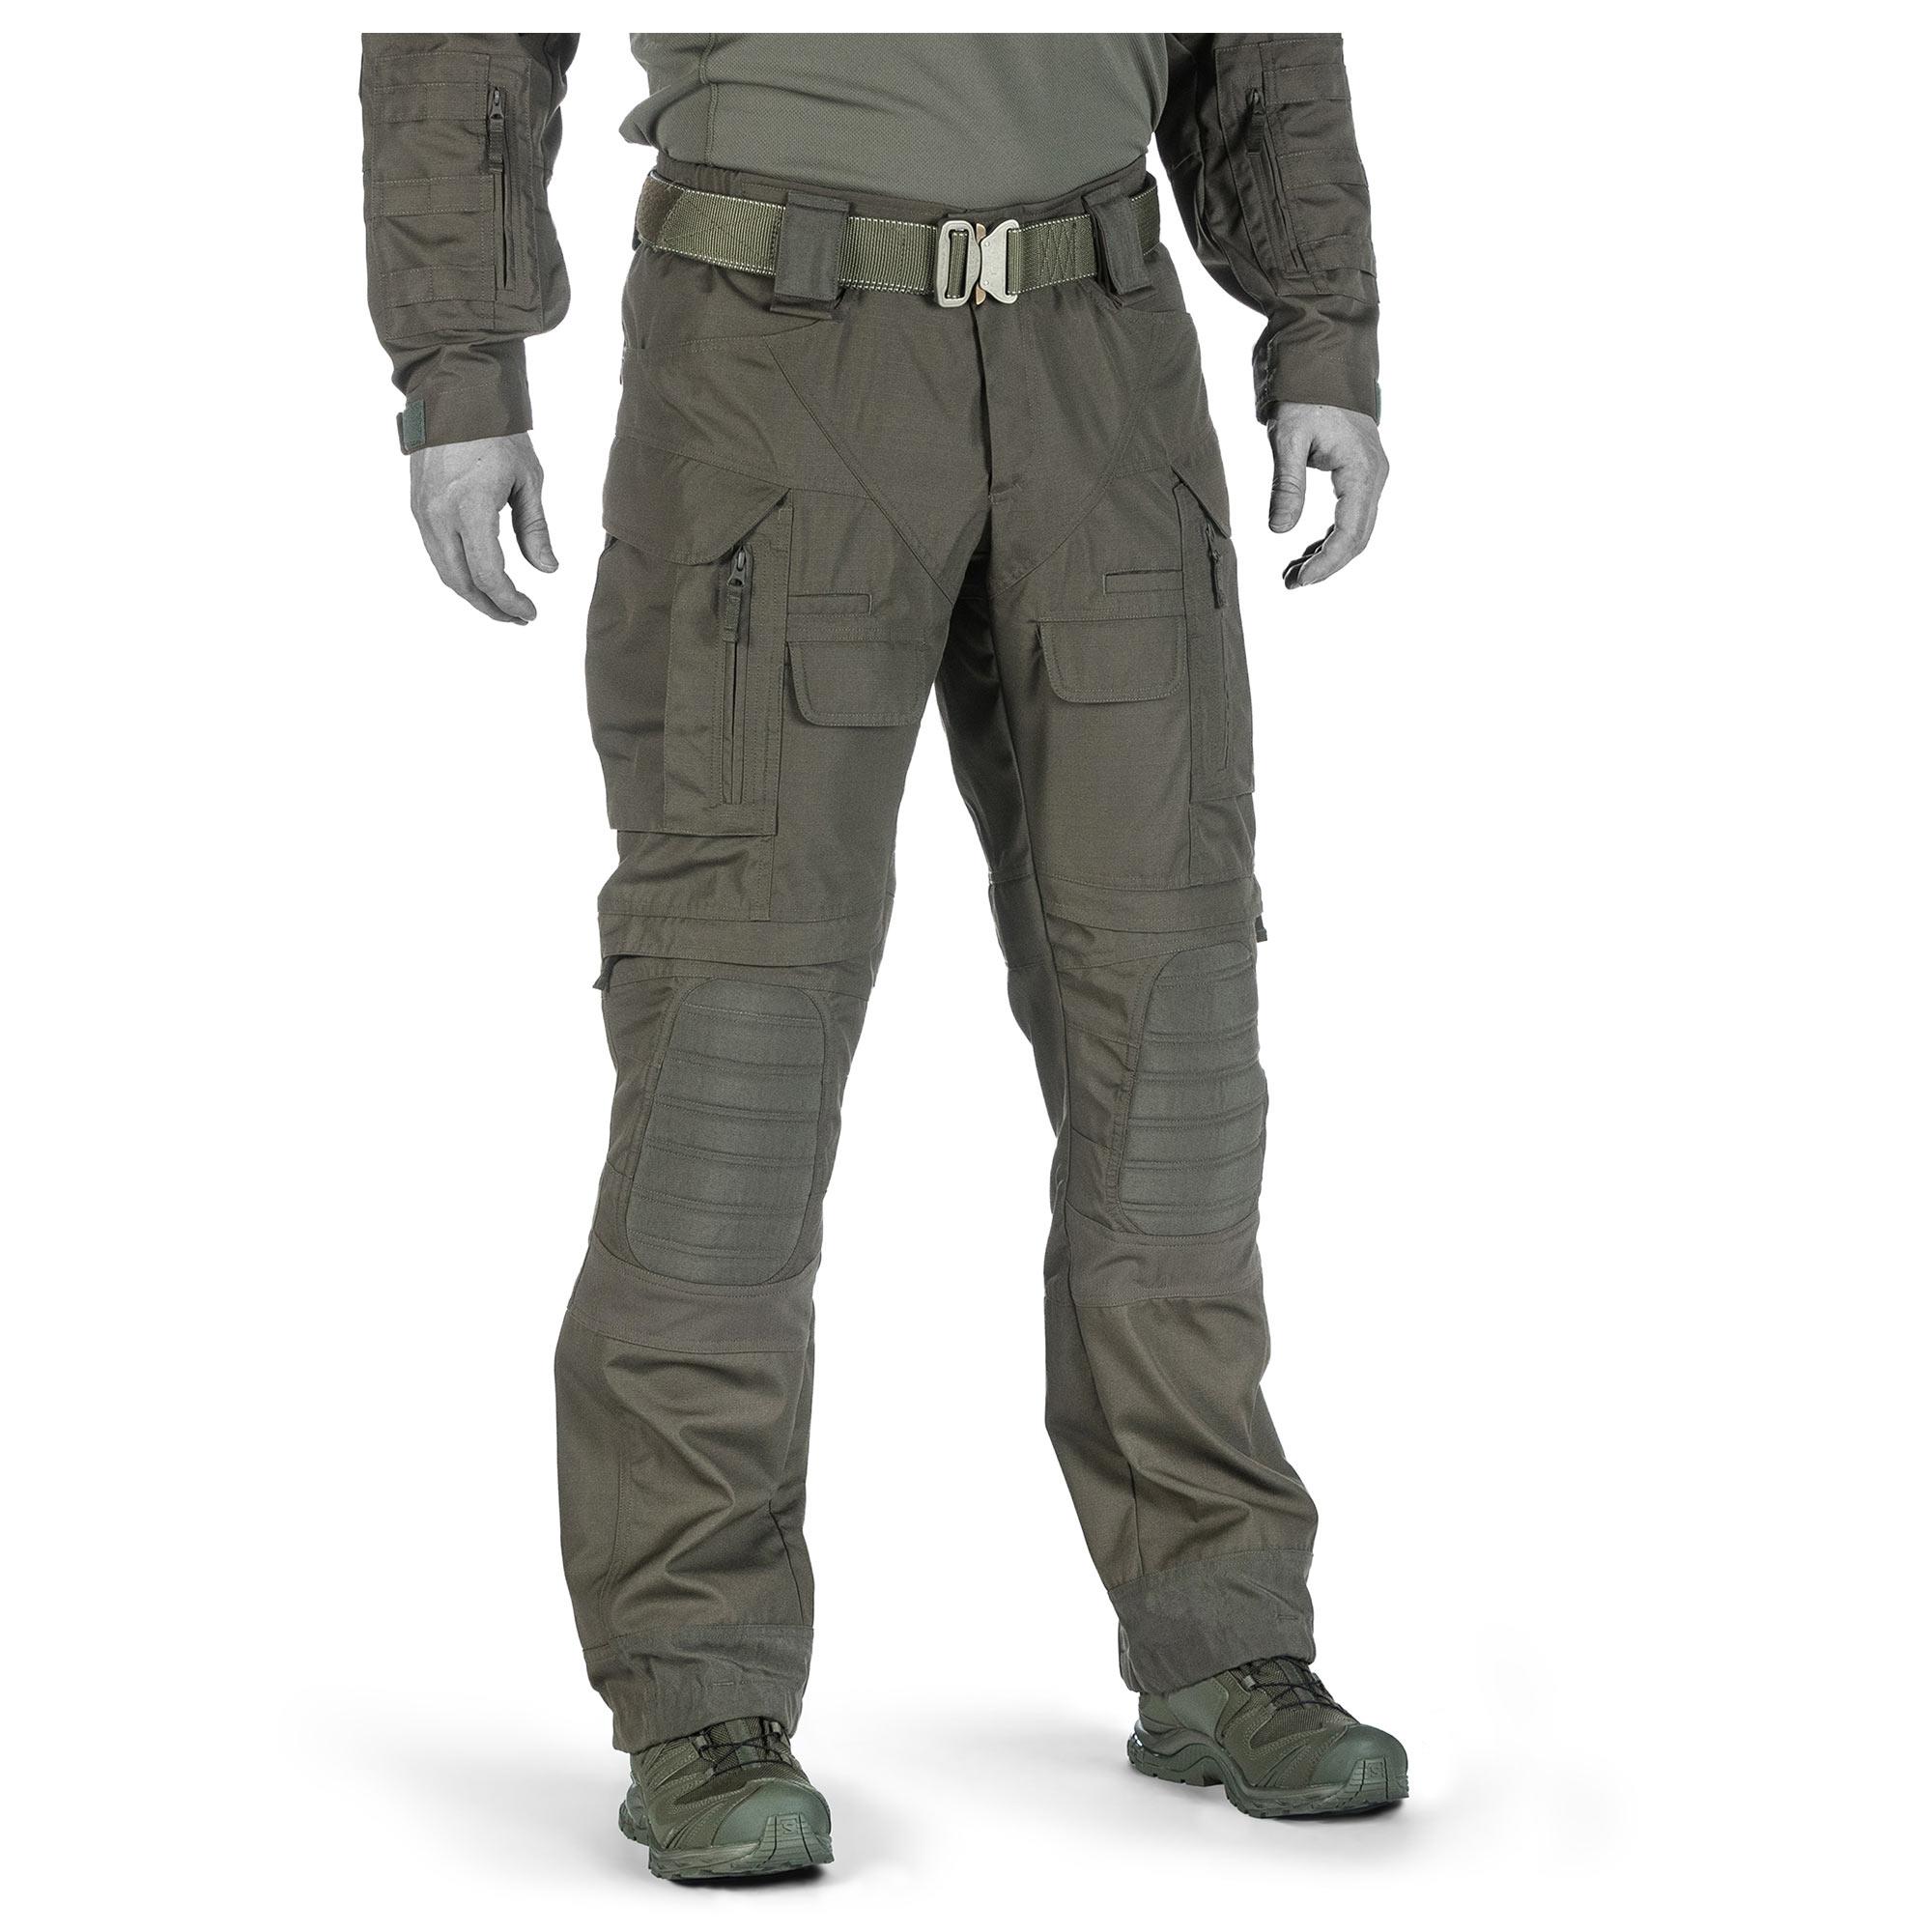 UF Pro Kampfhose Striker X Combat Pants brown grey